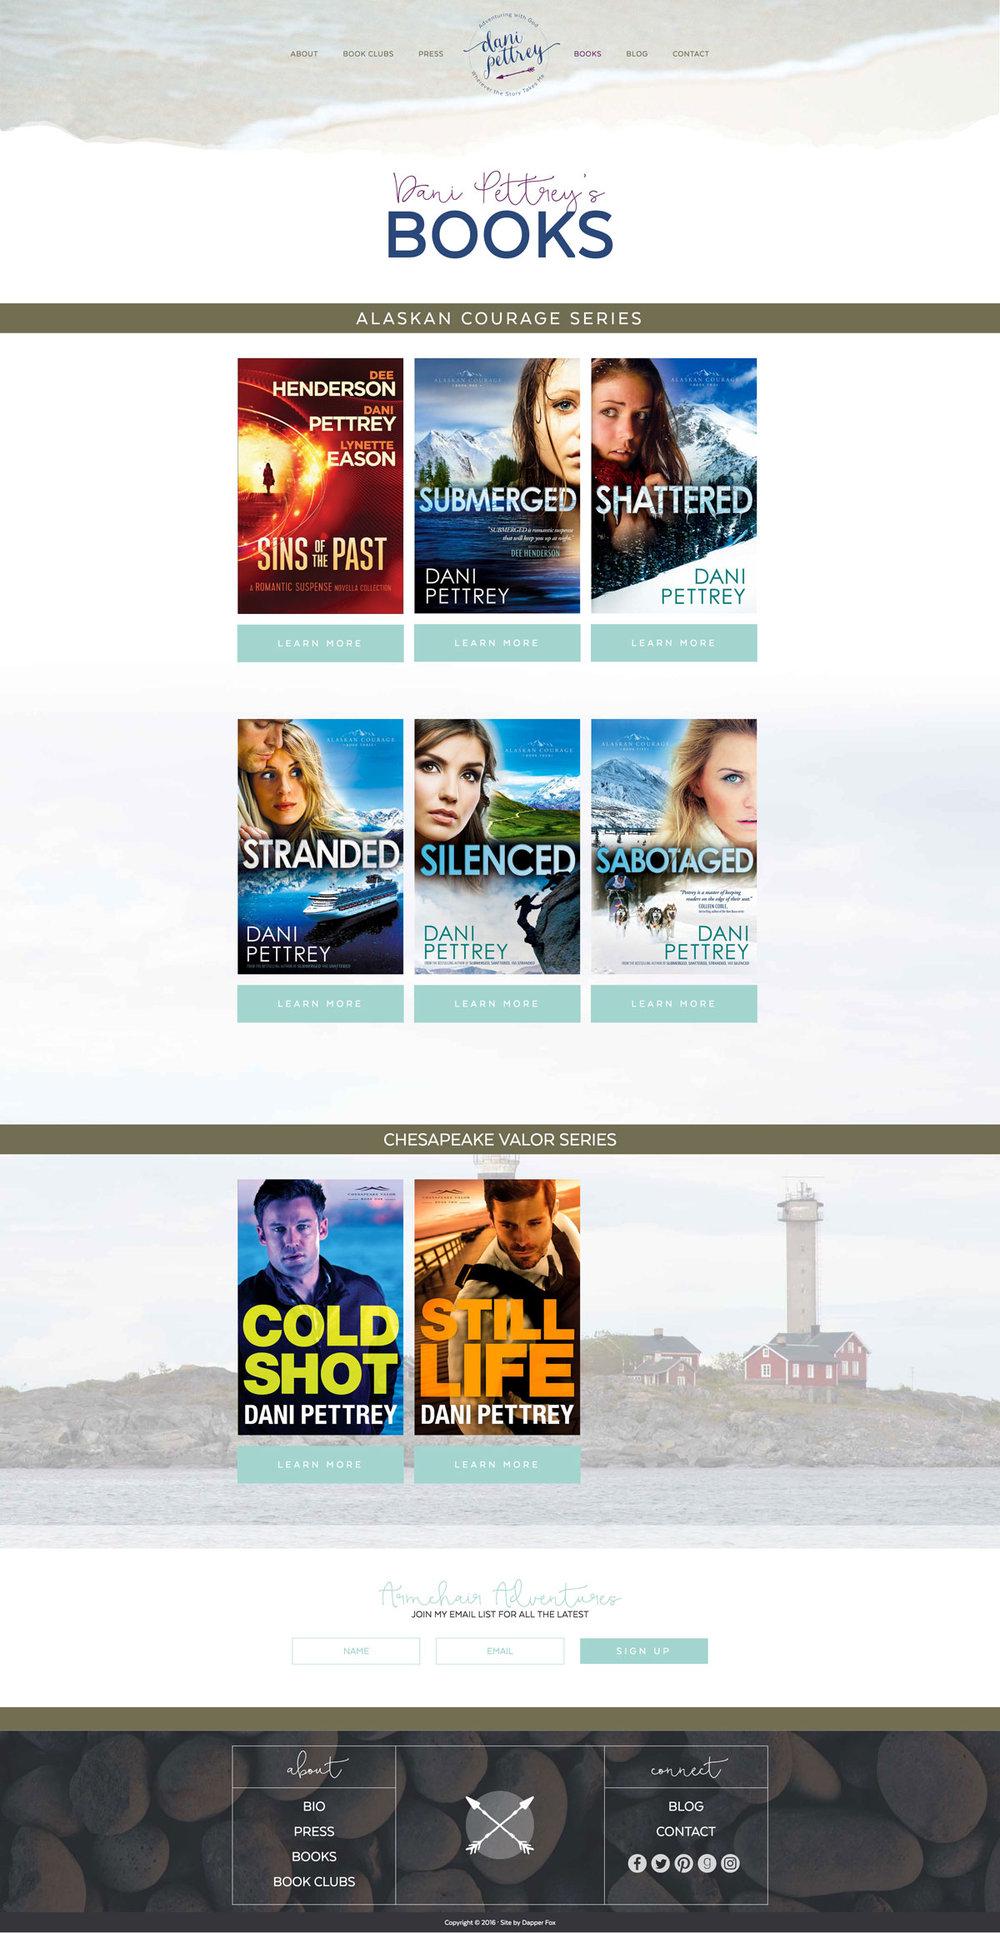 Dani Pettrey Award Winning Book Author Wordpress Website andBranding Design #Coastal #Beach #Ocean #Design #Modern